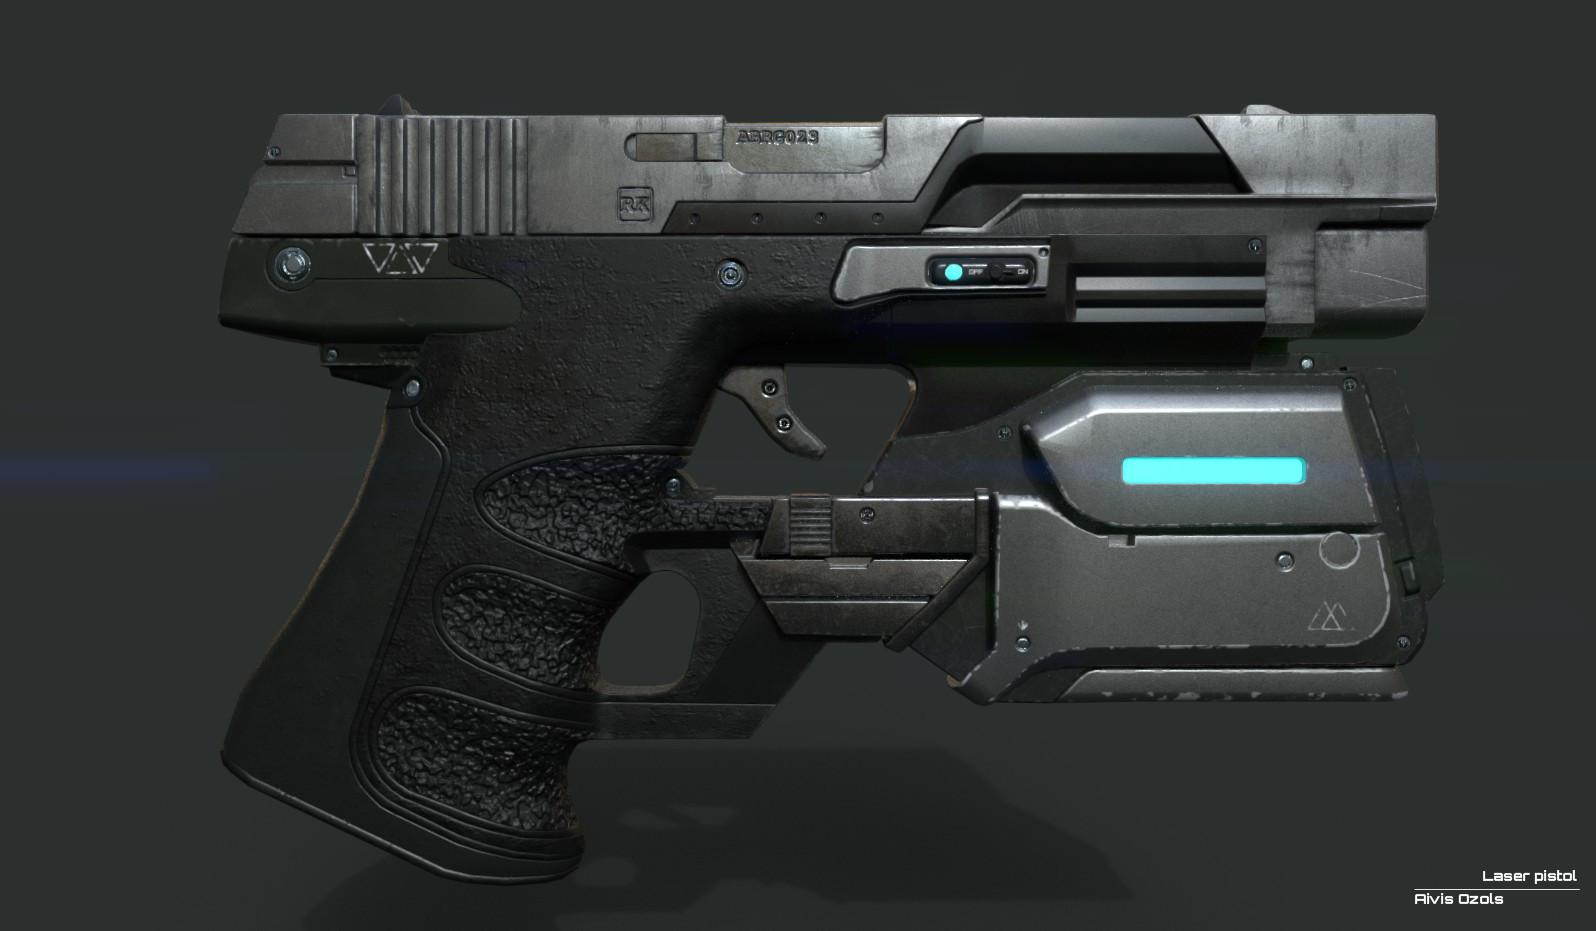 Aivis ozols pistol03